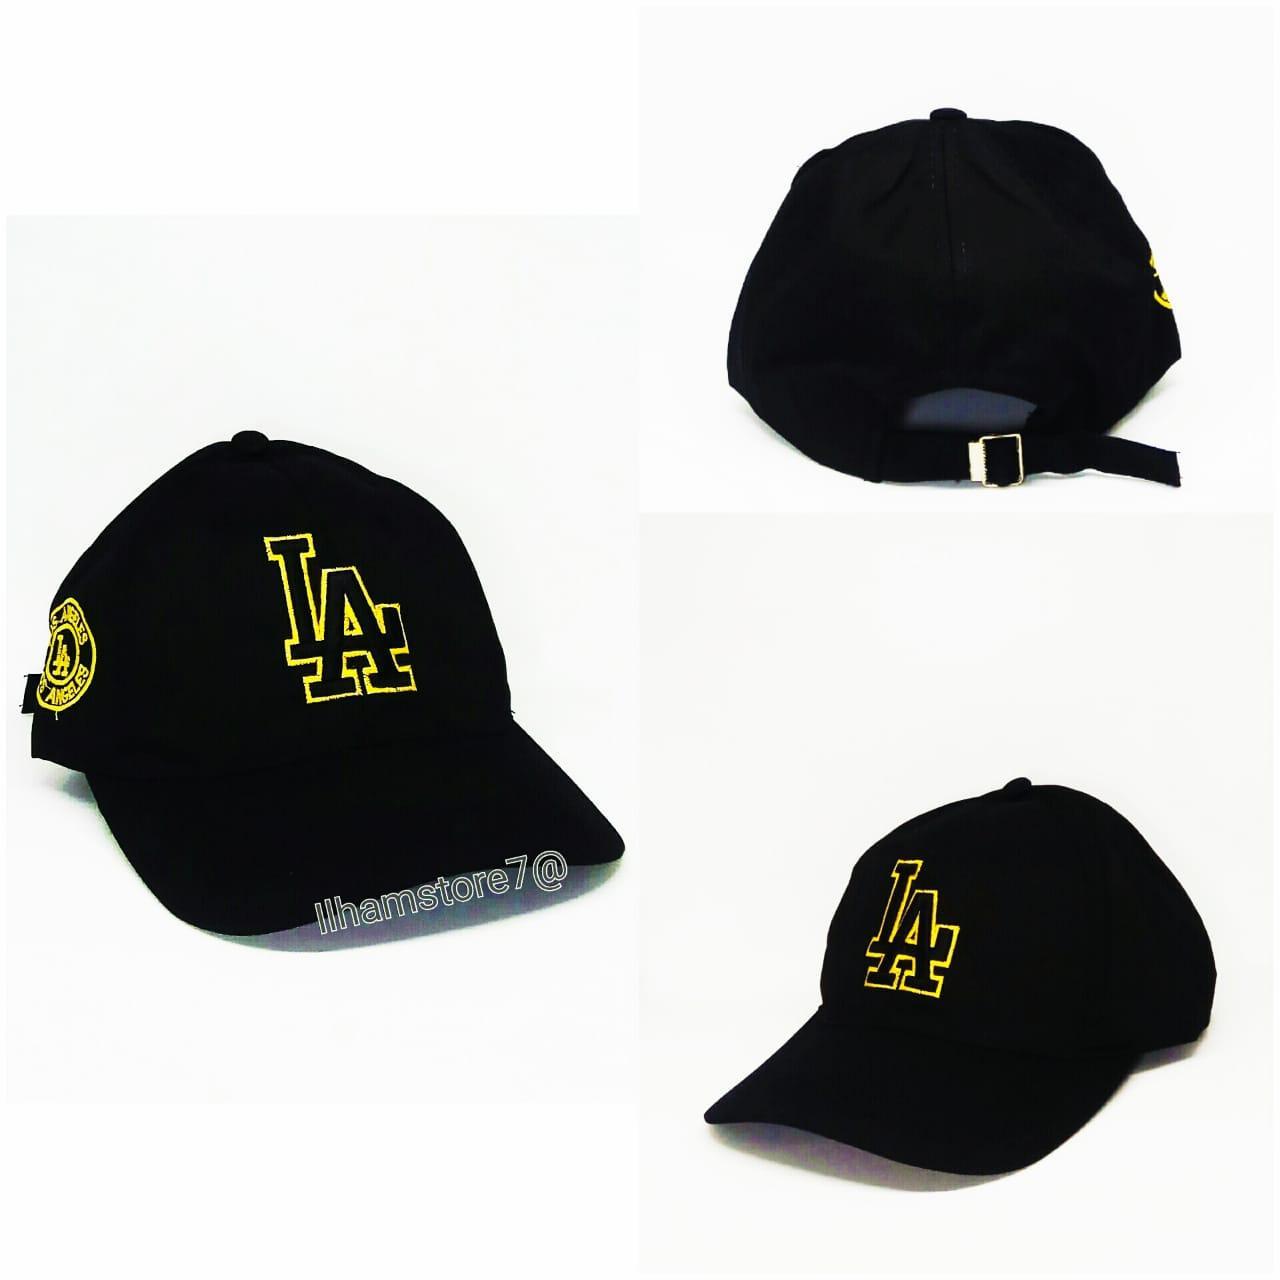 Topi distro pria/topi original bordir/topi snapback premium